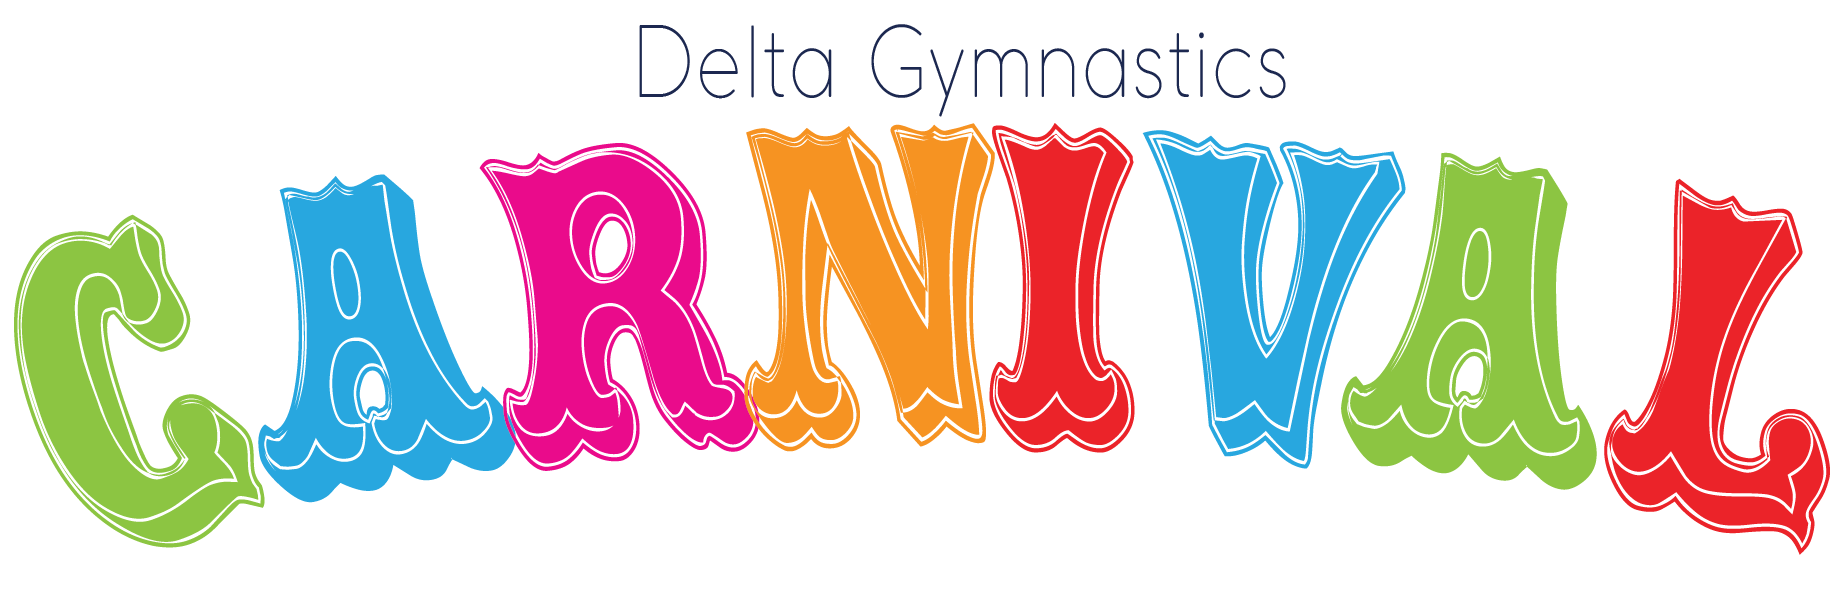 Carnival clipart kids carnival. Delta brisbane gym gymnastics